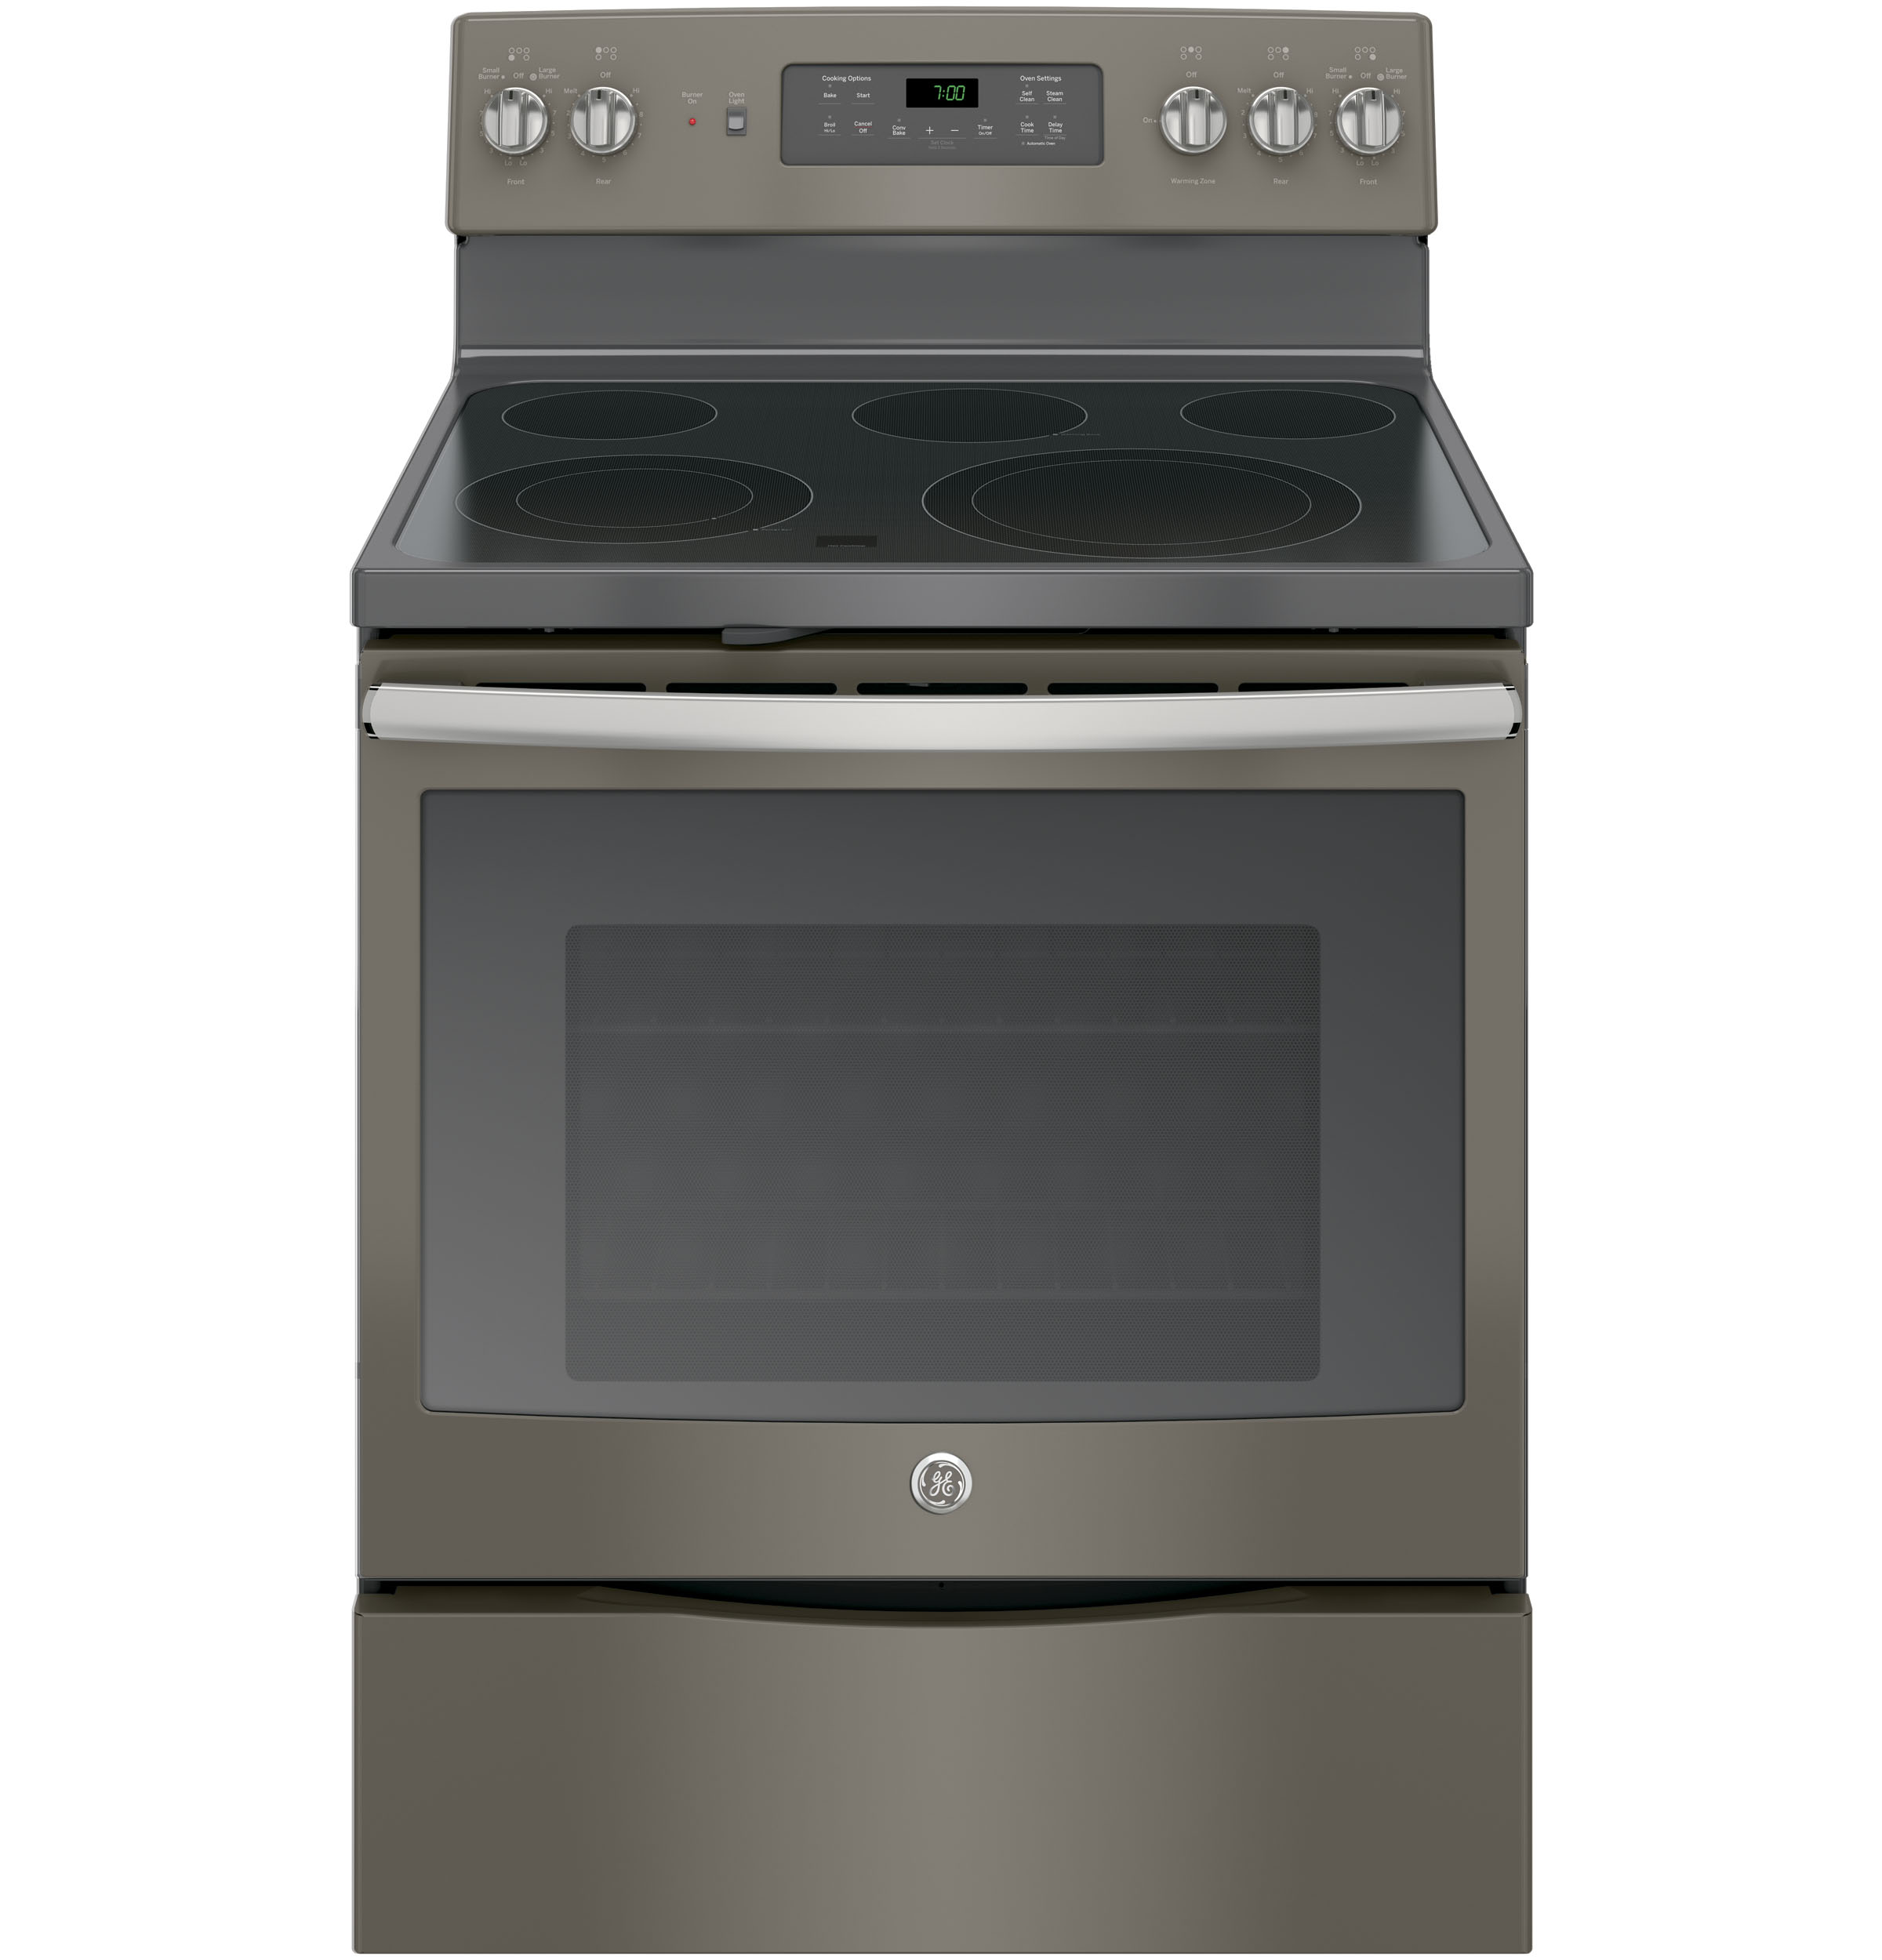 "GE Appliances GE Electric Ranges 30"" Electric Convection Range - Item Number: JB700EJES"